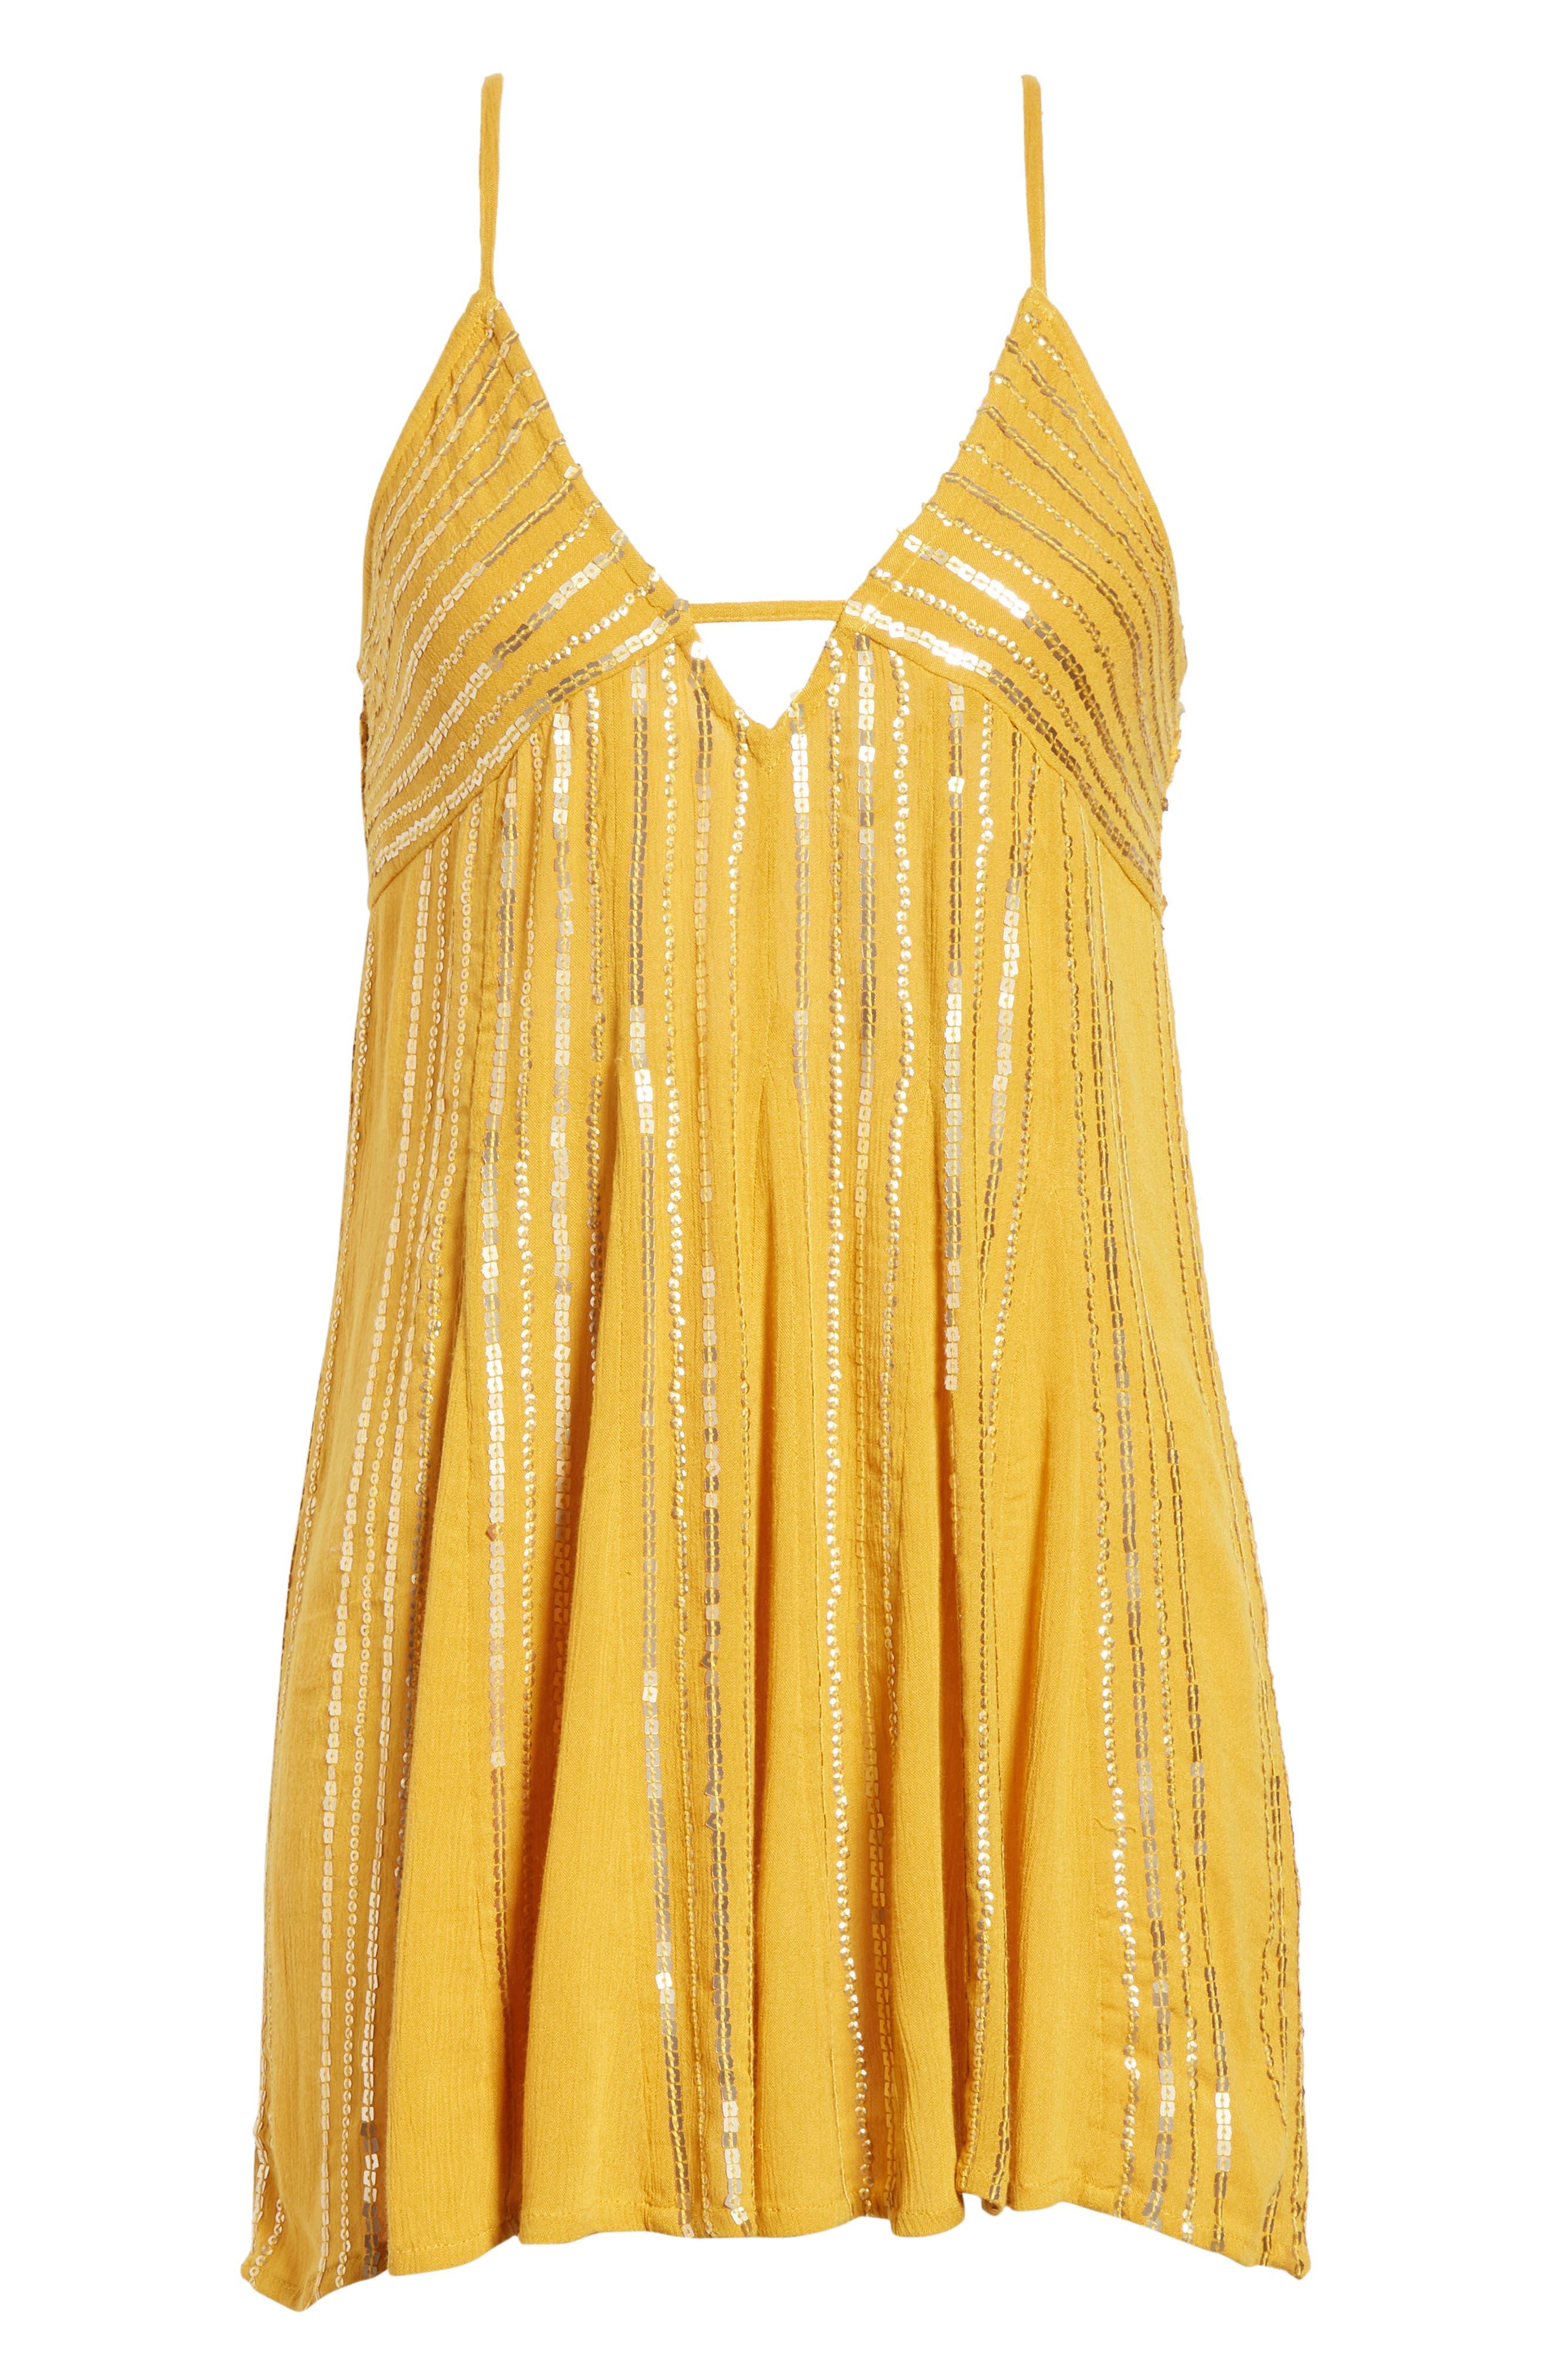 Here She Is Embellished Swing Minidress,                             Alternate thumbnail 8, color,                             710